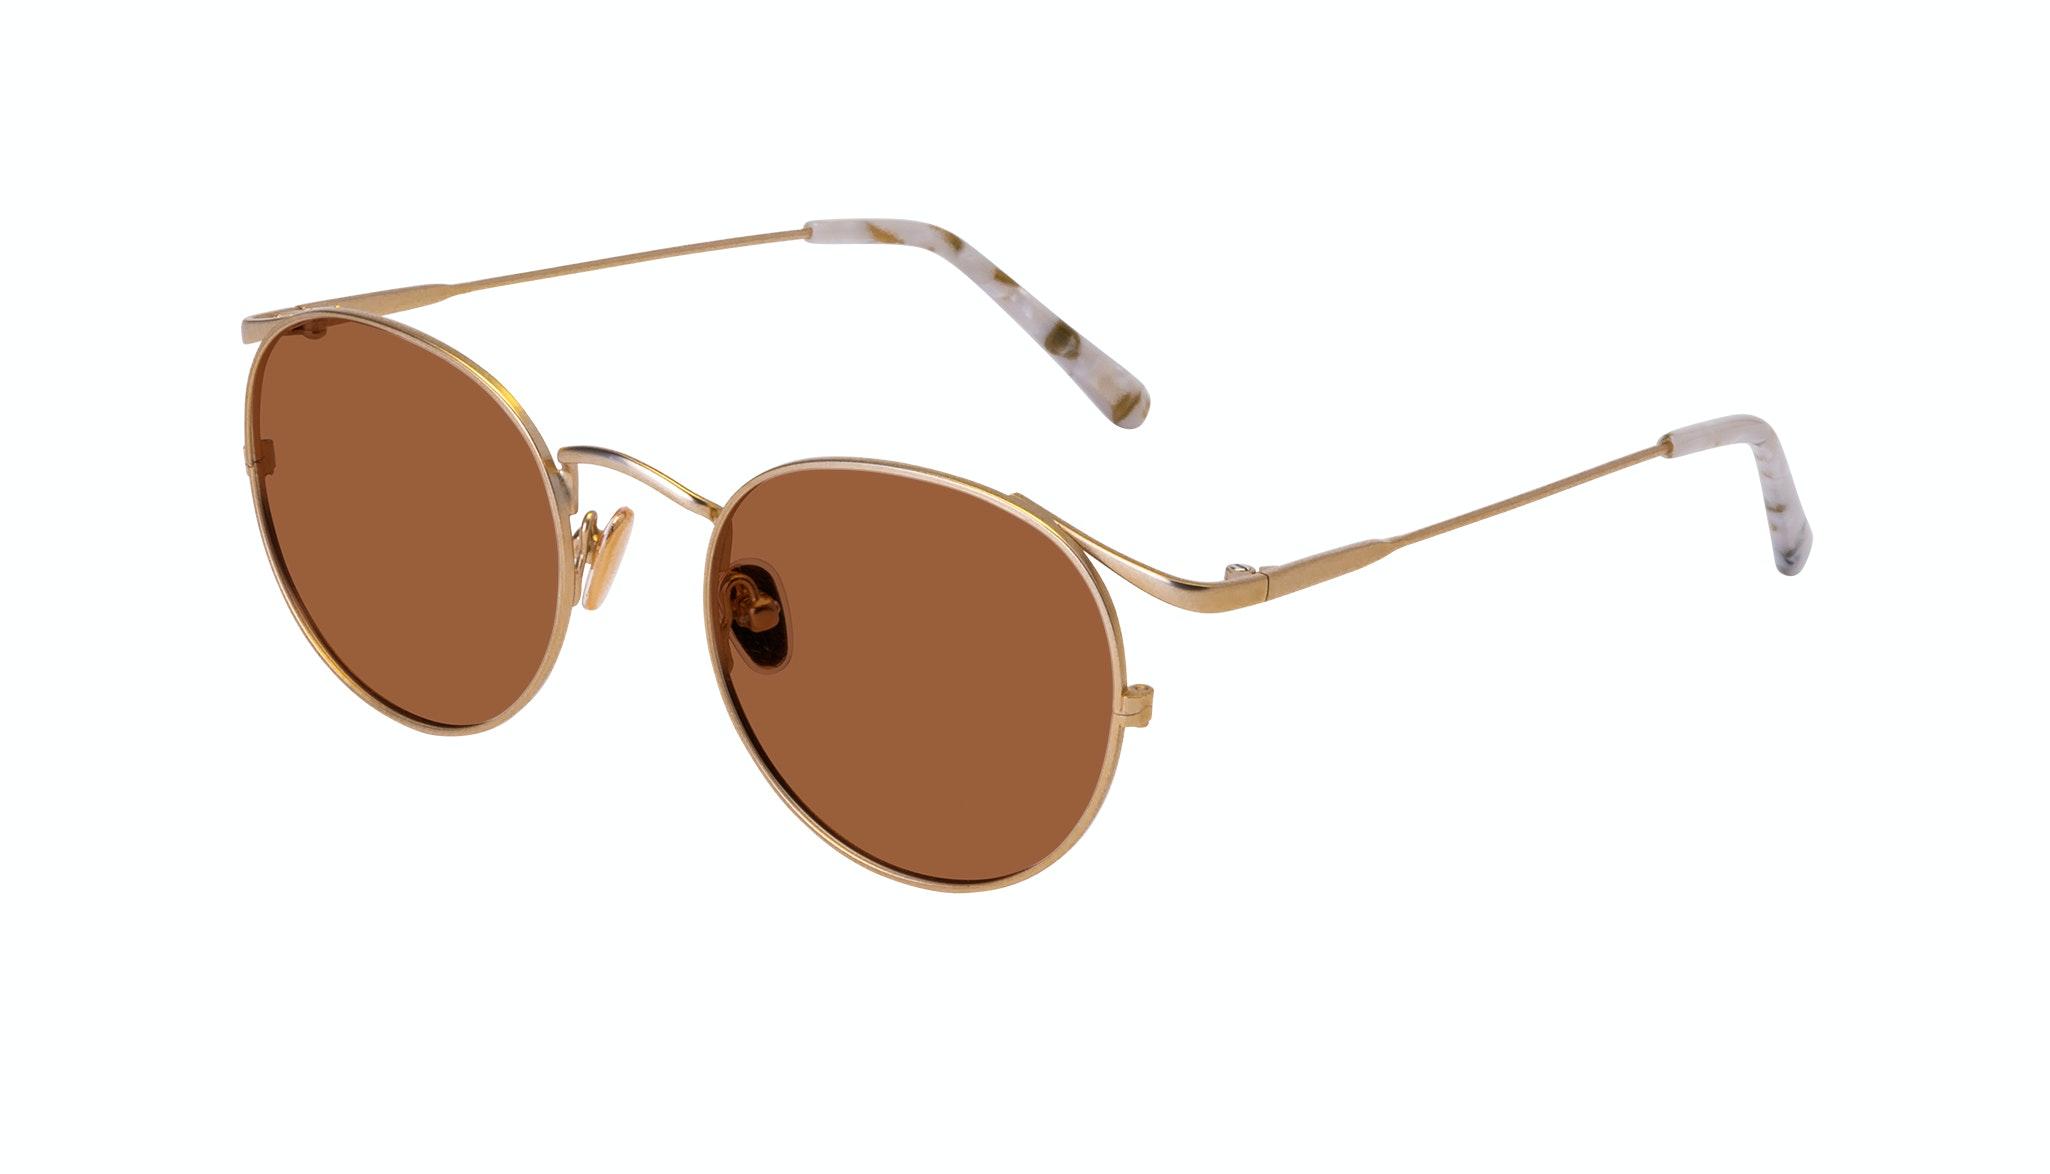 Affordable Fashion Glasses Round Sunglasses Women Curve Gold Tilt